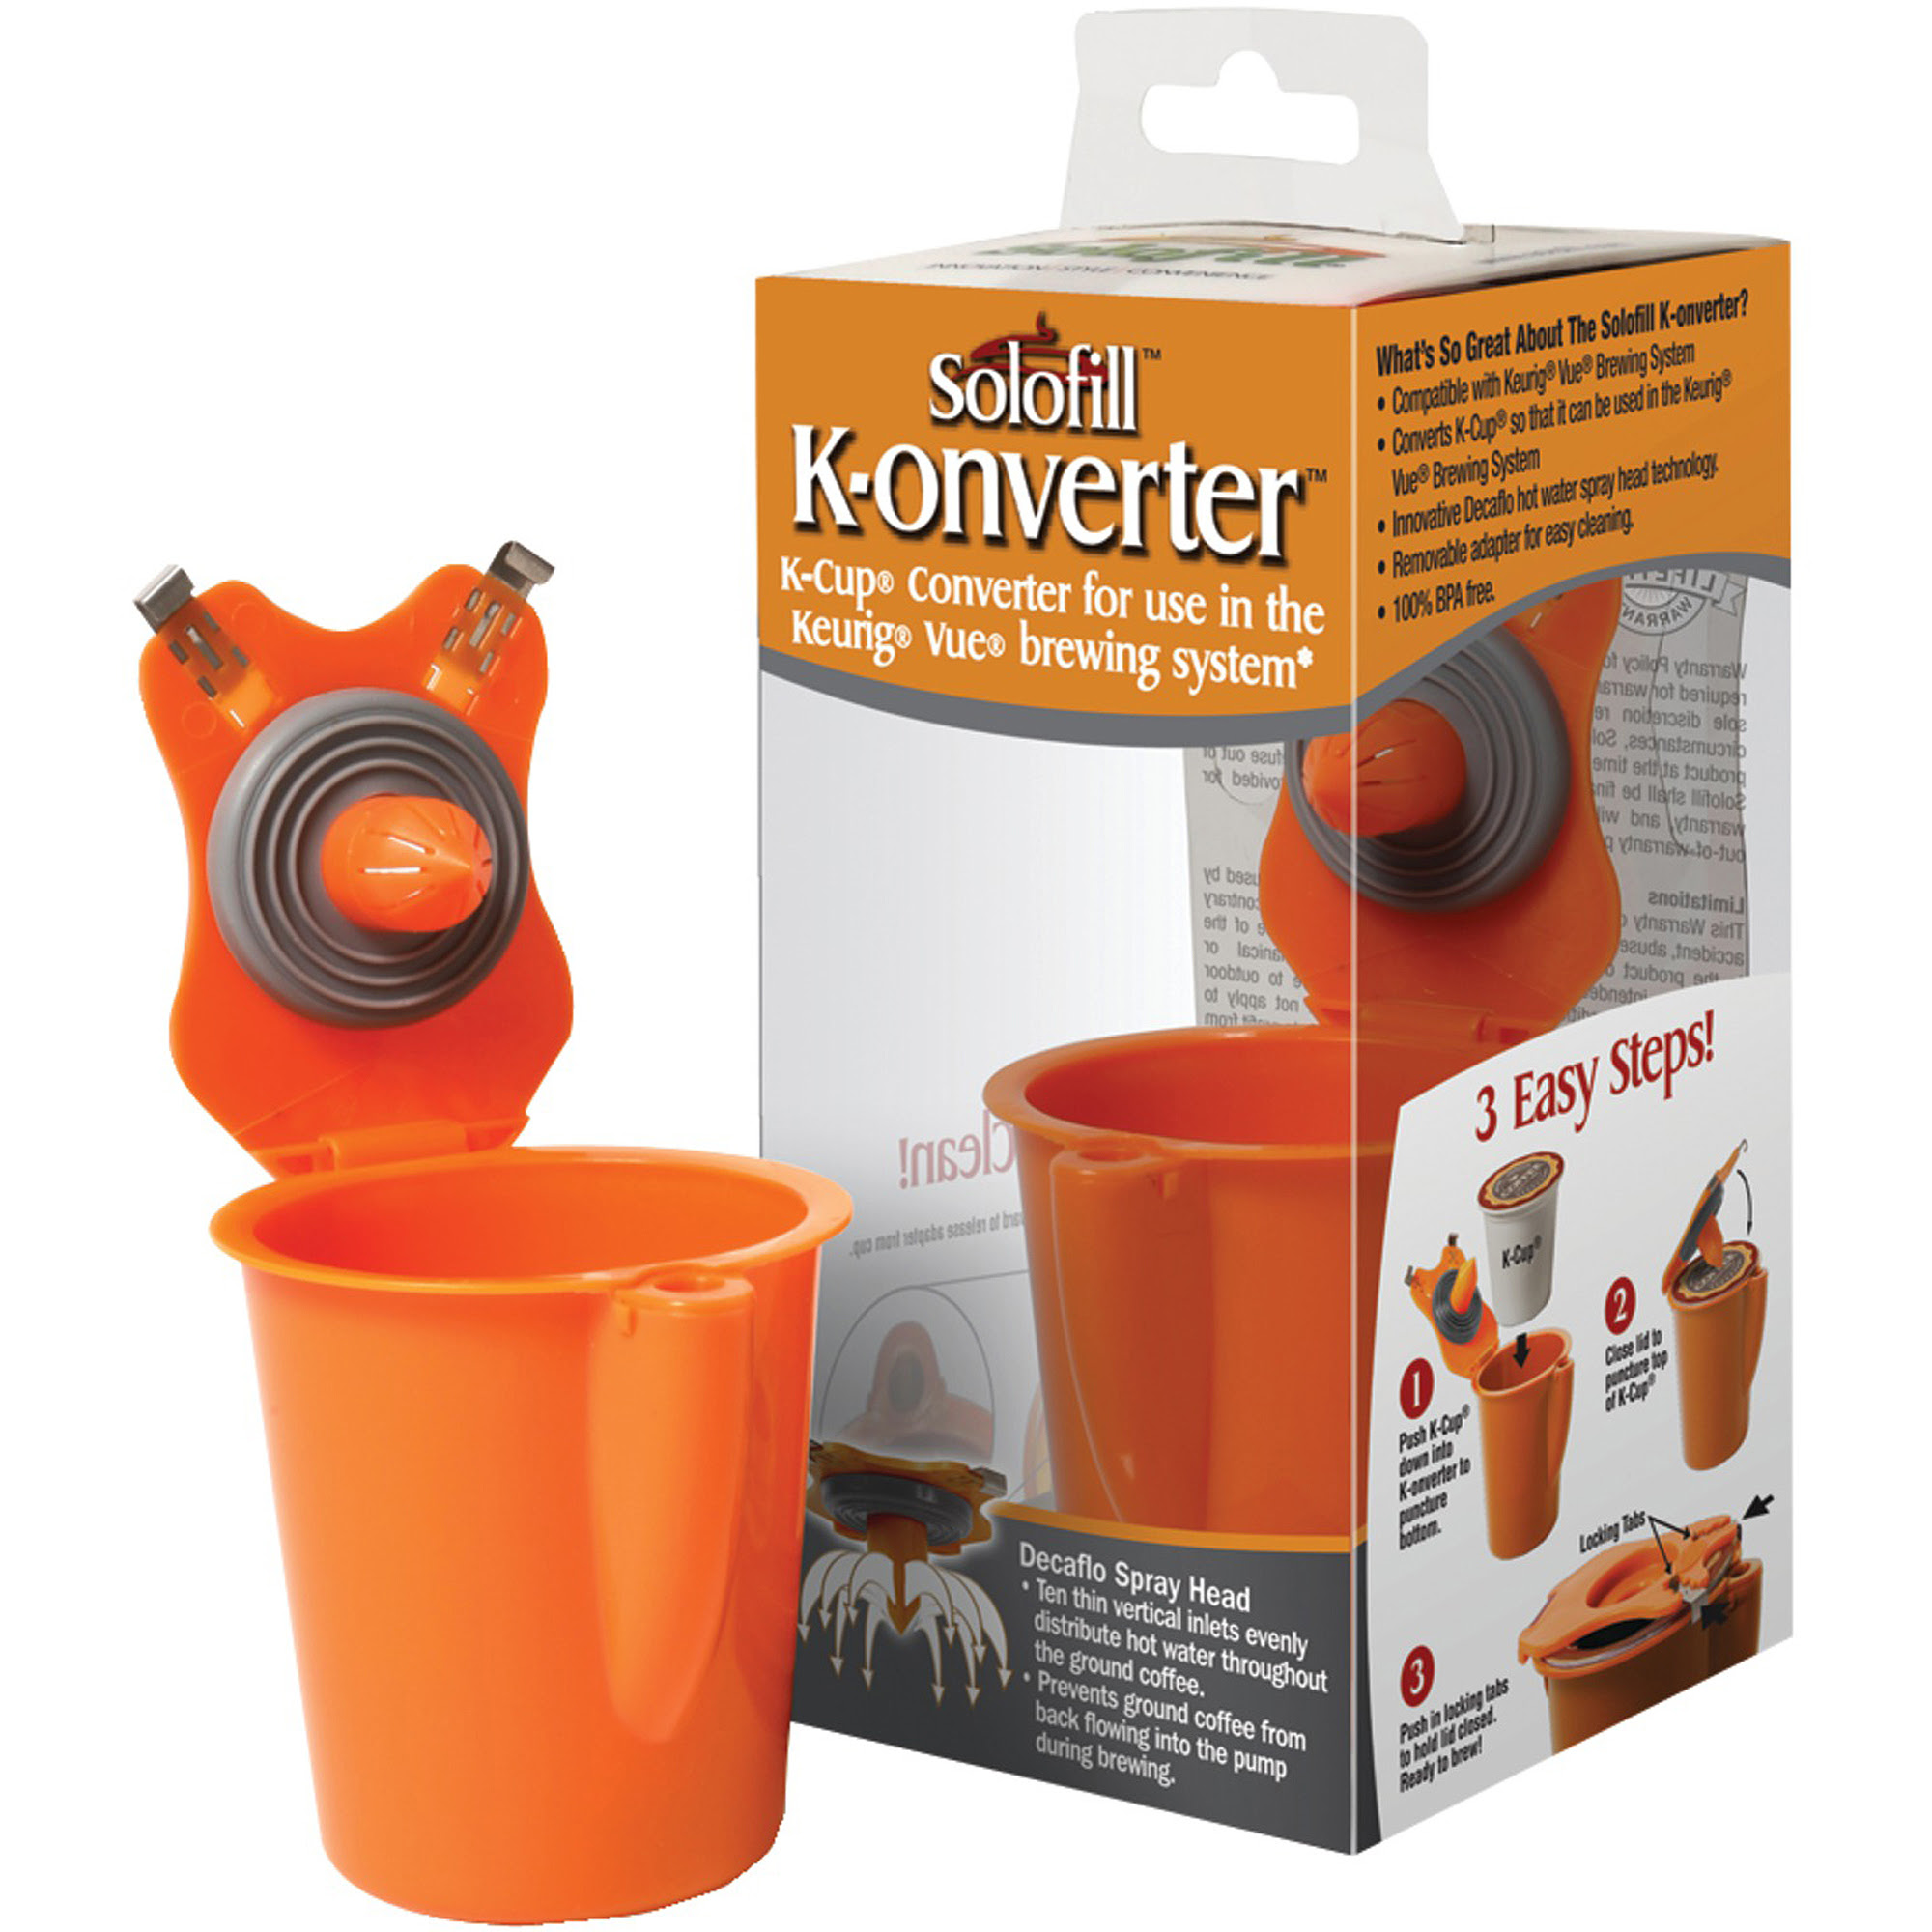 Keurig My K-Cup Reusable Coffee Filter - Walmart.com